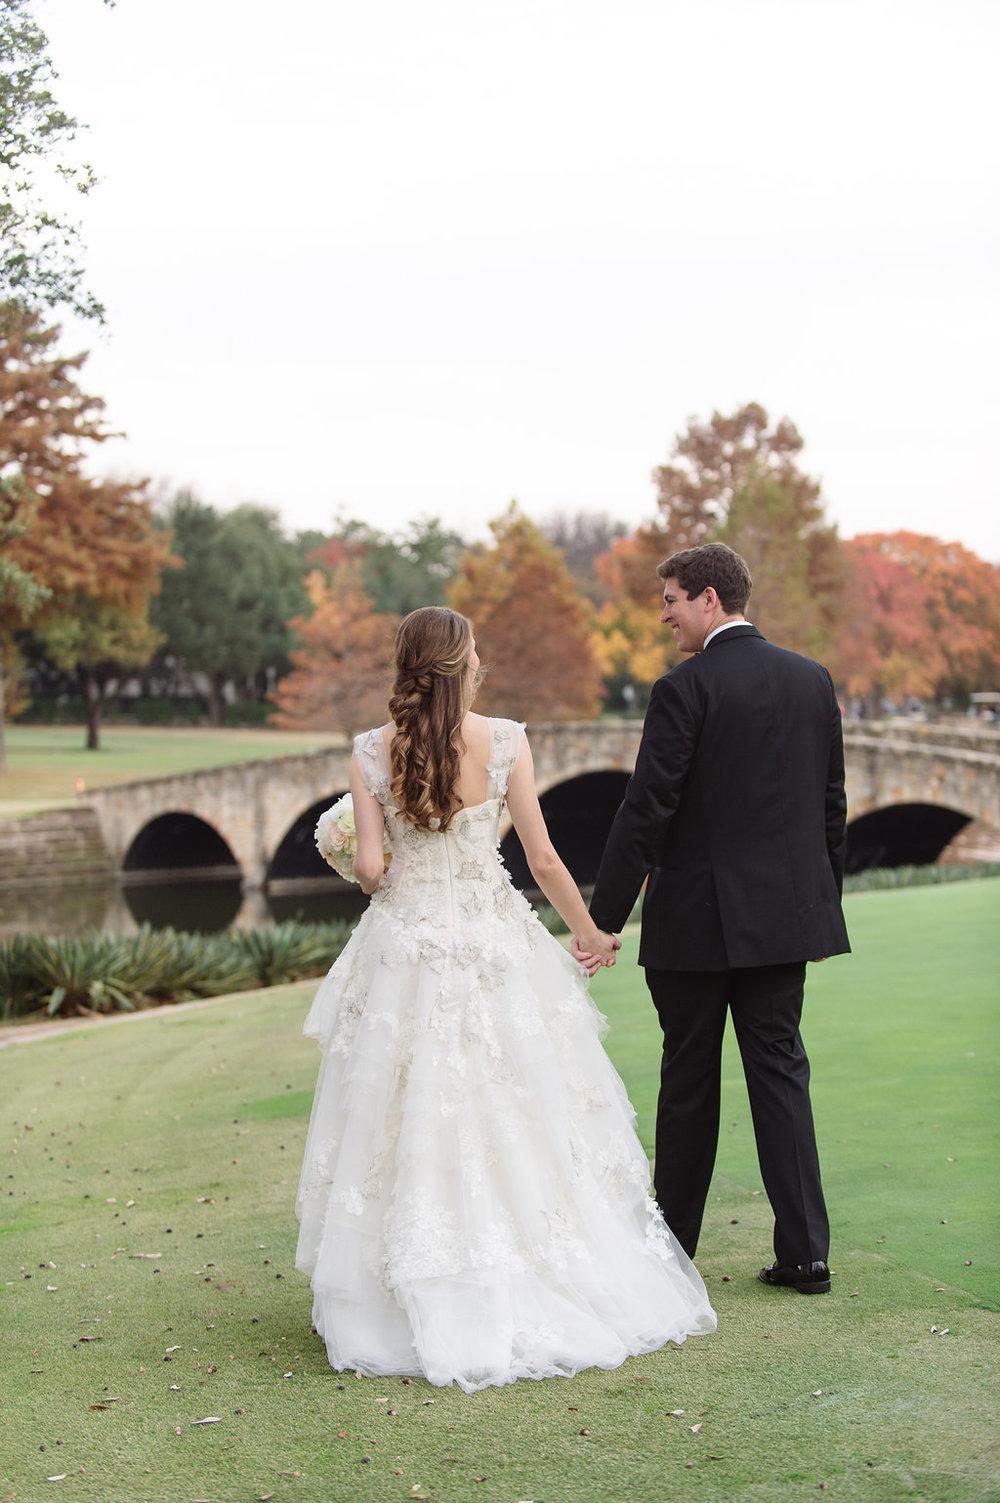 caroline_events_dallas_wedding_planner_dallas_country_club_wedding